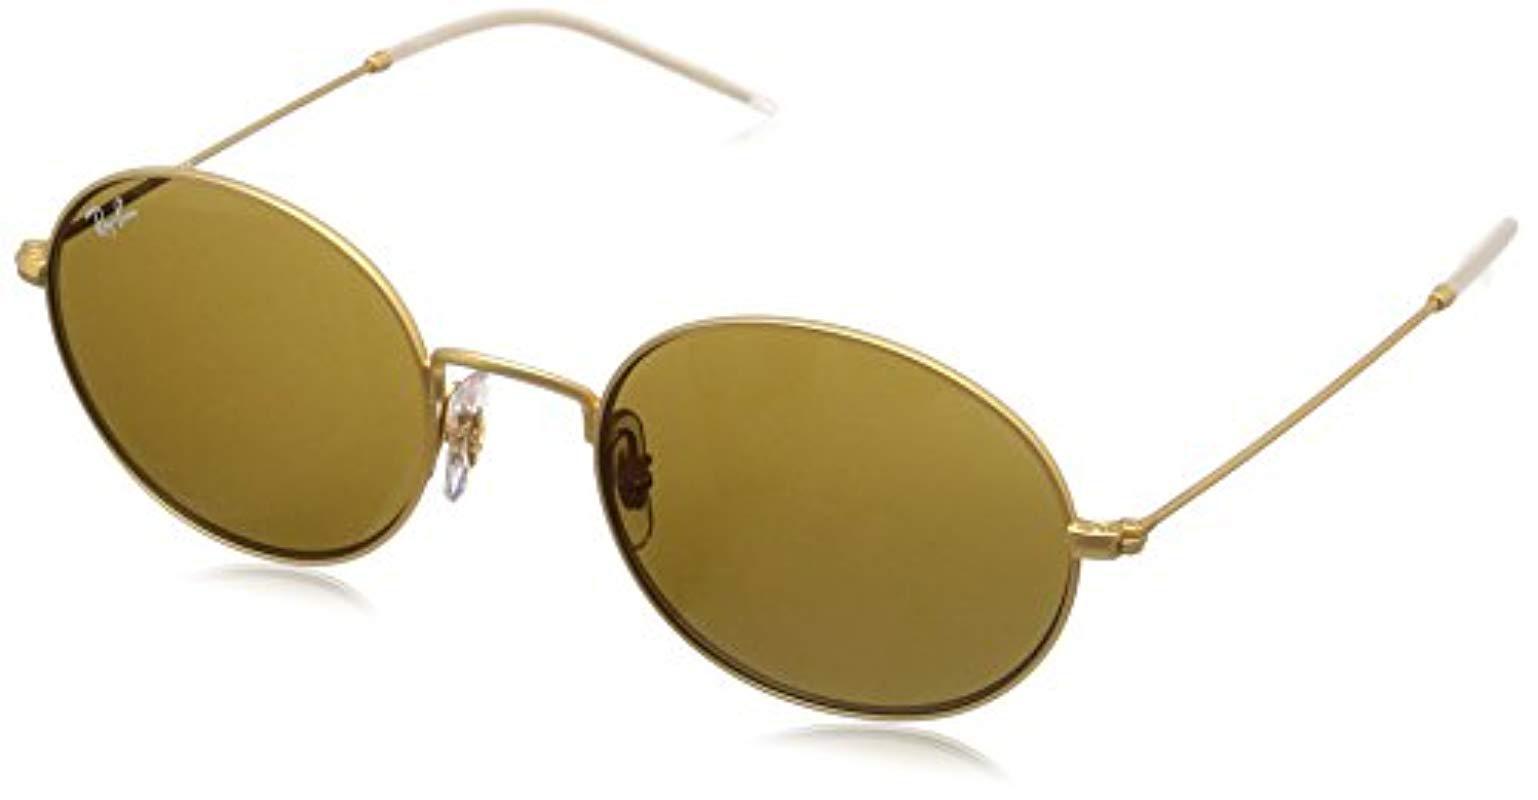 cdbbbb4e1e9 Ray-Ban. Rayban Unisex s 0rb3594 901373 53 Sunglasses